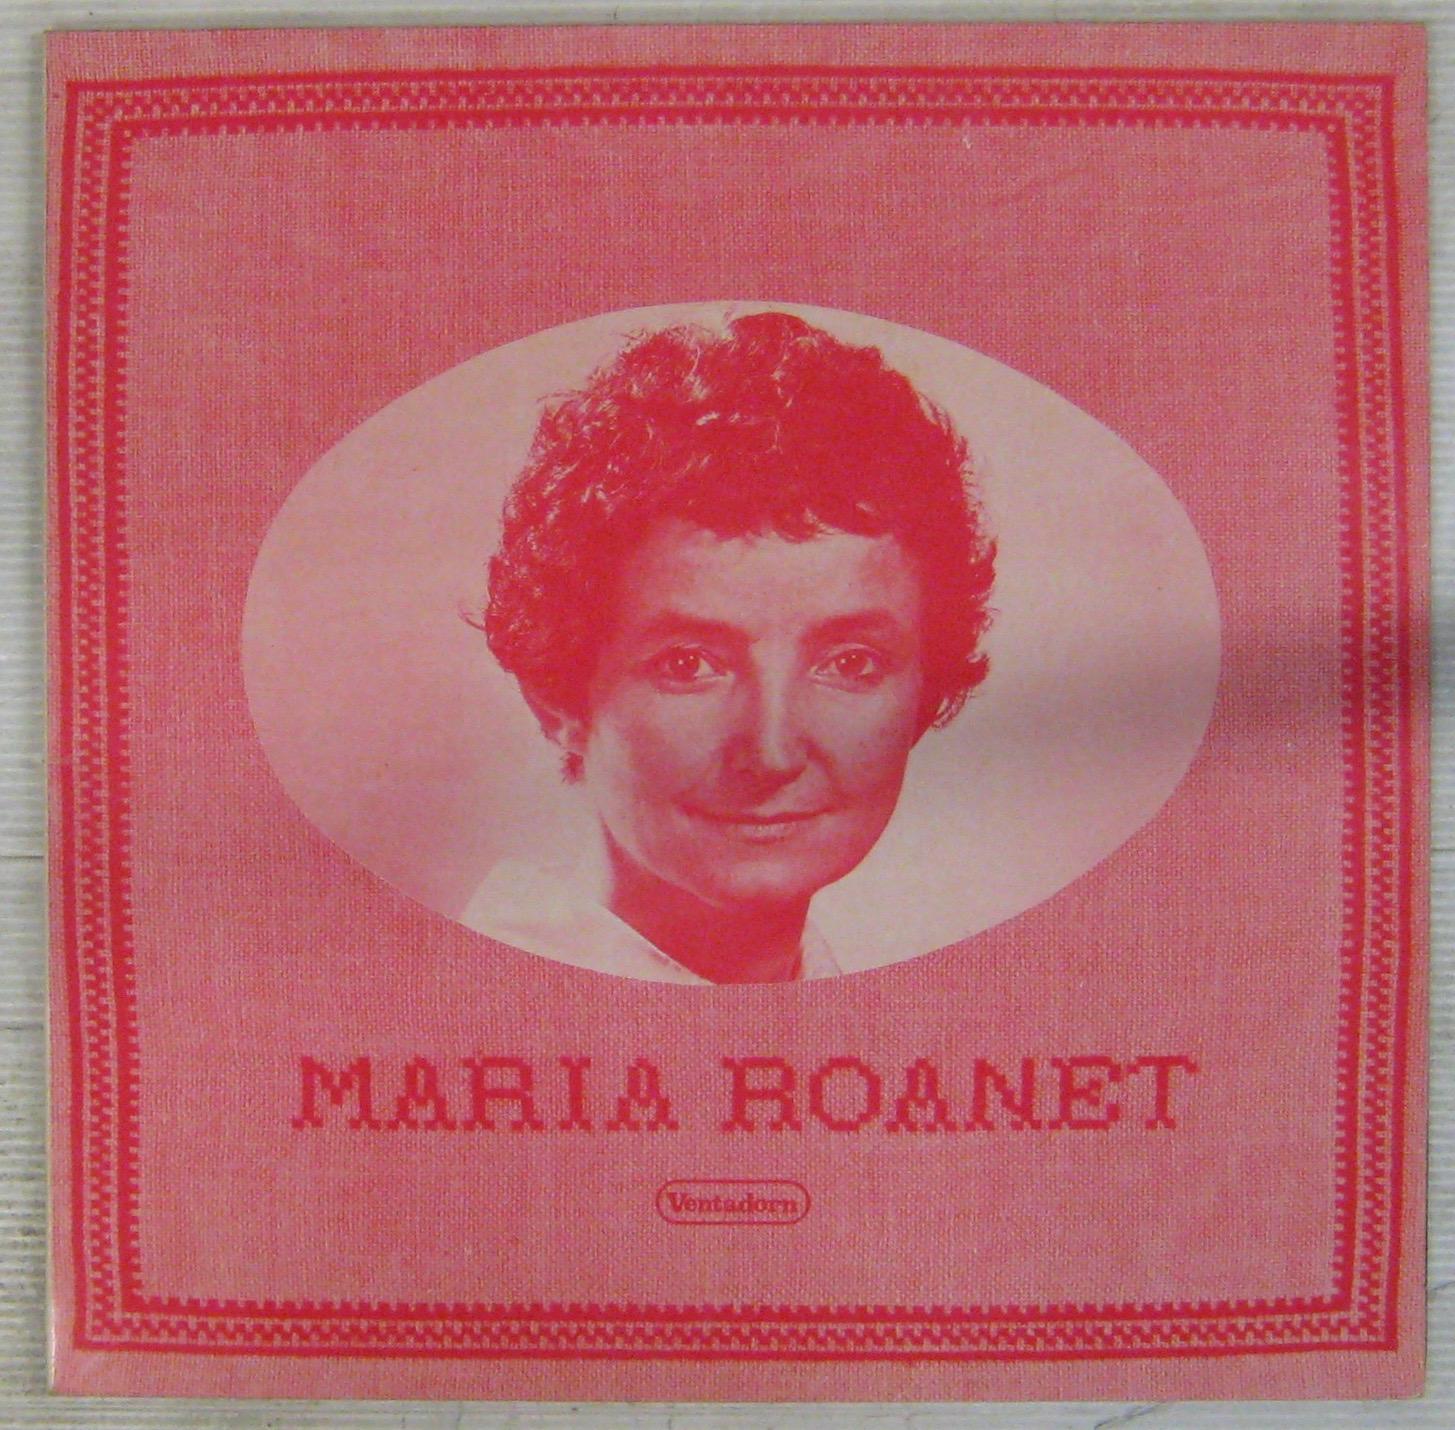 ROANET MARIA - Cecila - 33T Gatefold